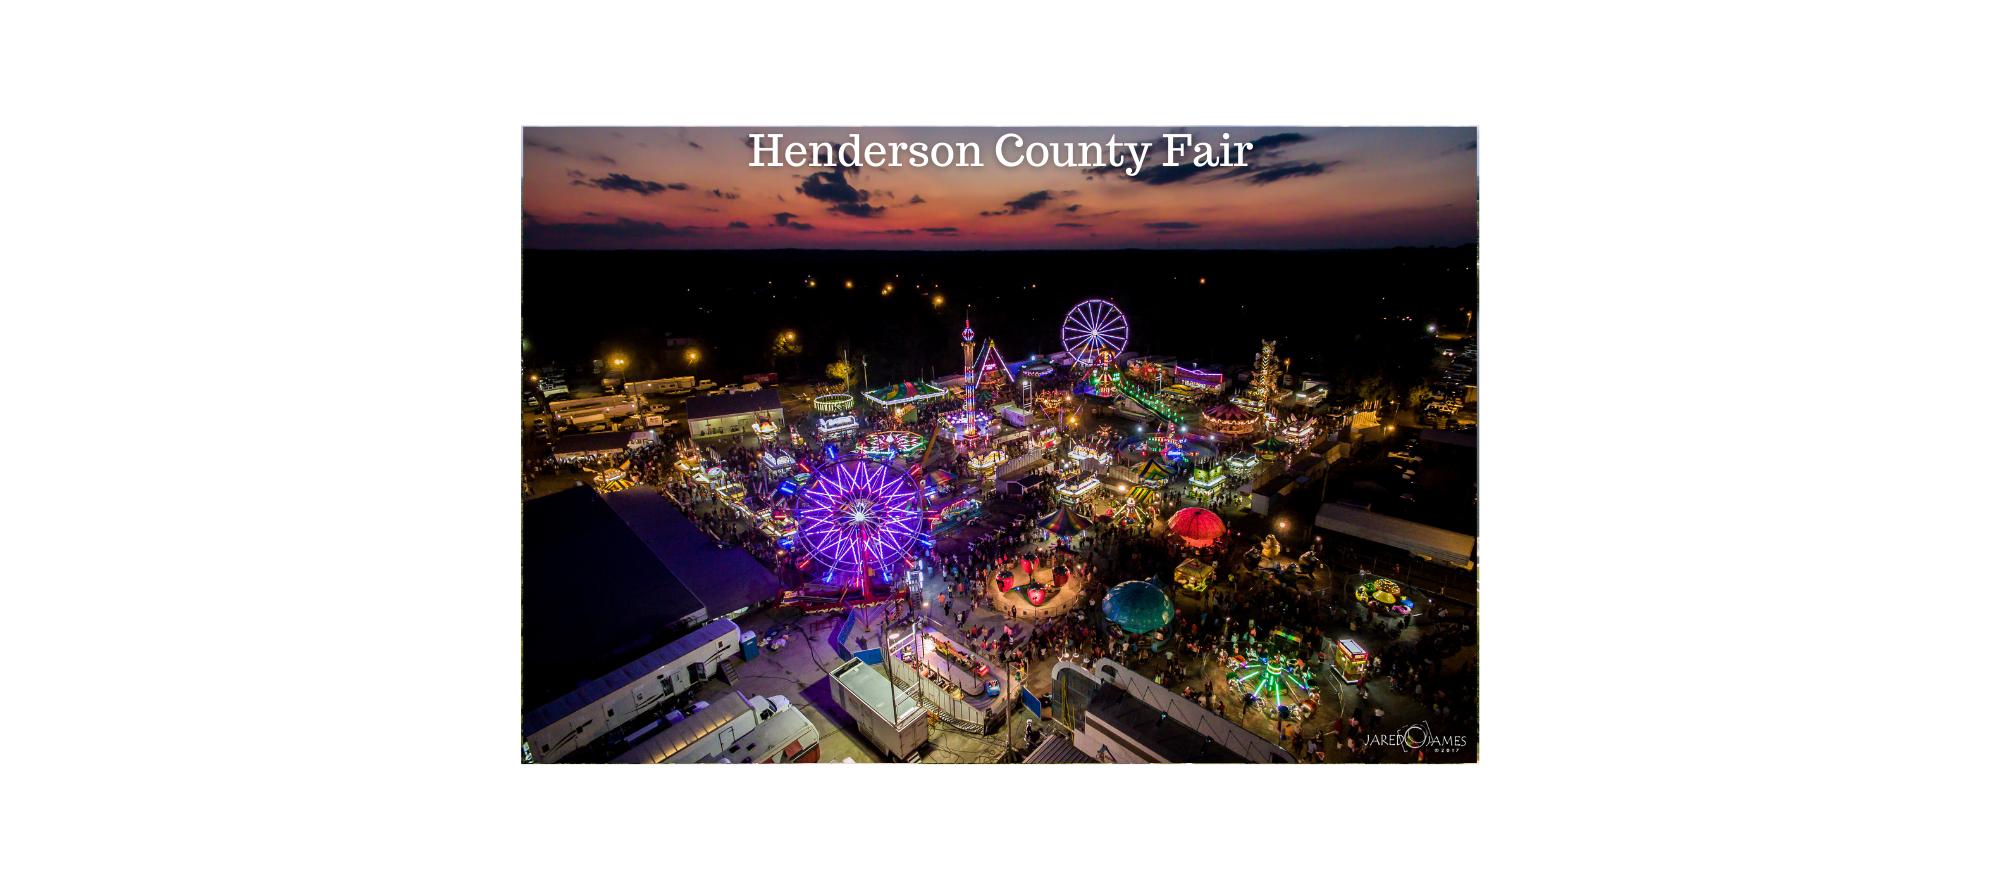 Henderson County Fair